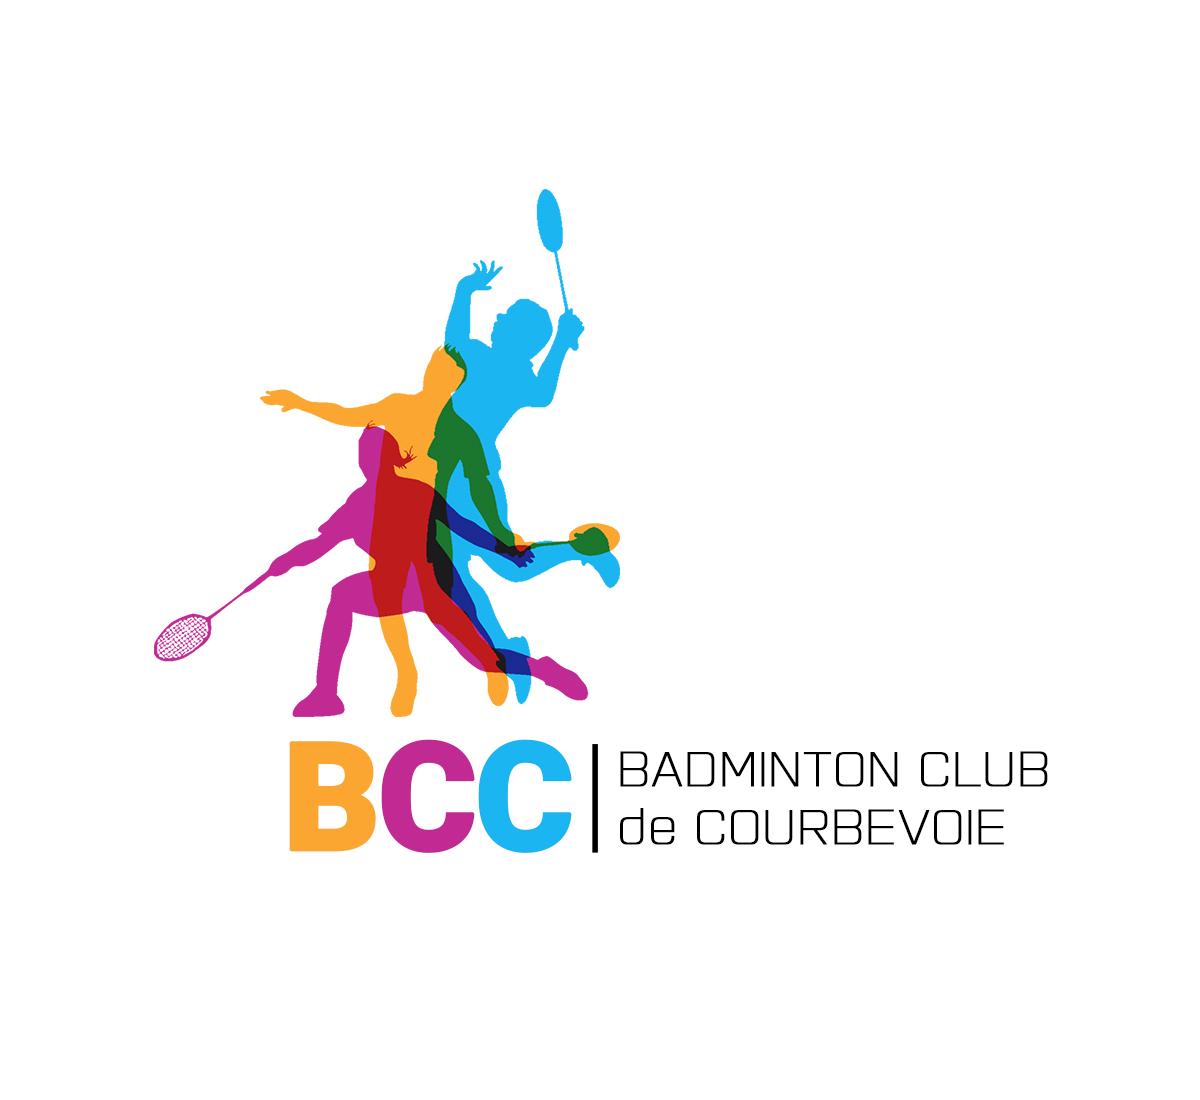 Modern, Personable Logo Design for BCC / Badminton Club de